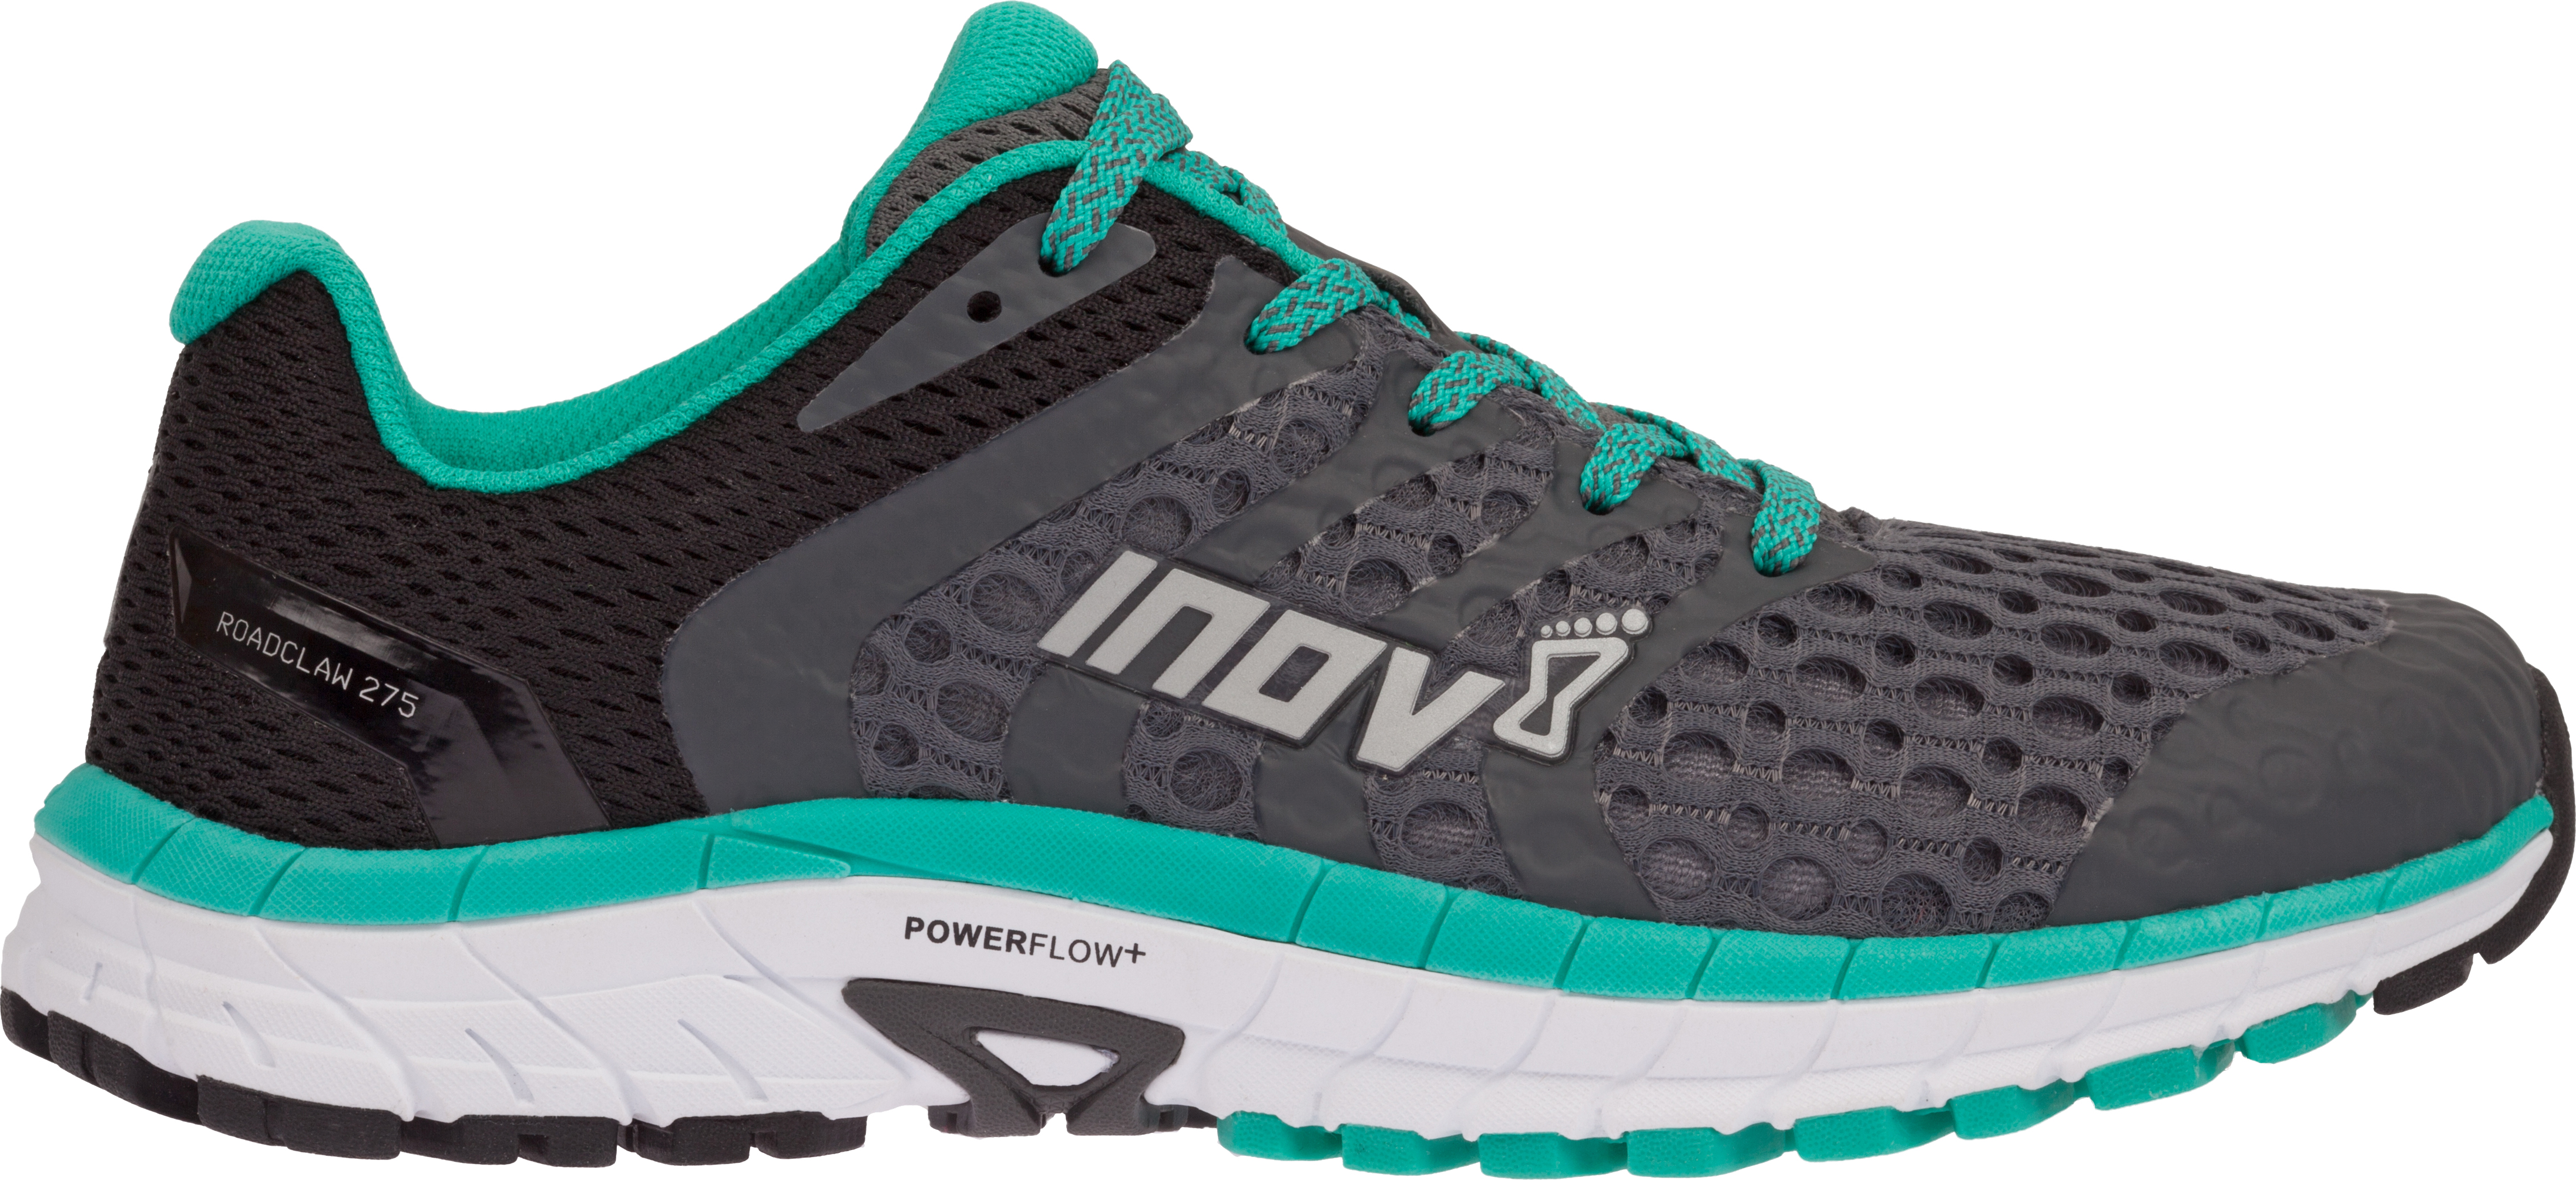 56716884564a63 Inov-8 ROADCLAW 275 V2 Road Running Shoe - Women s